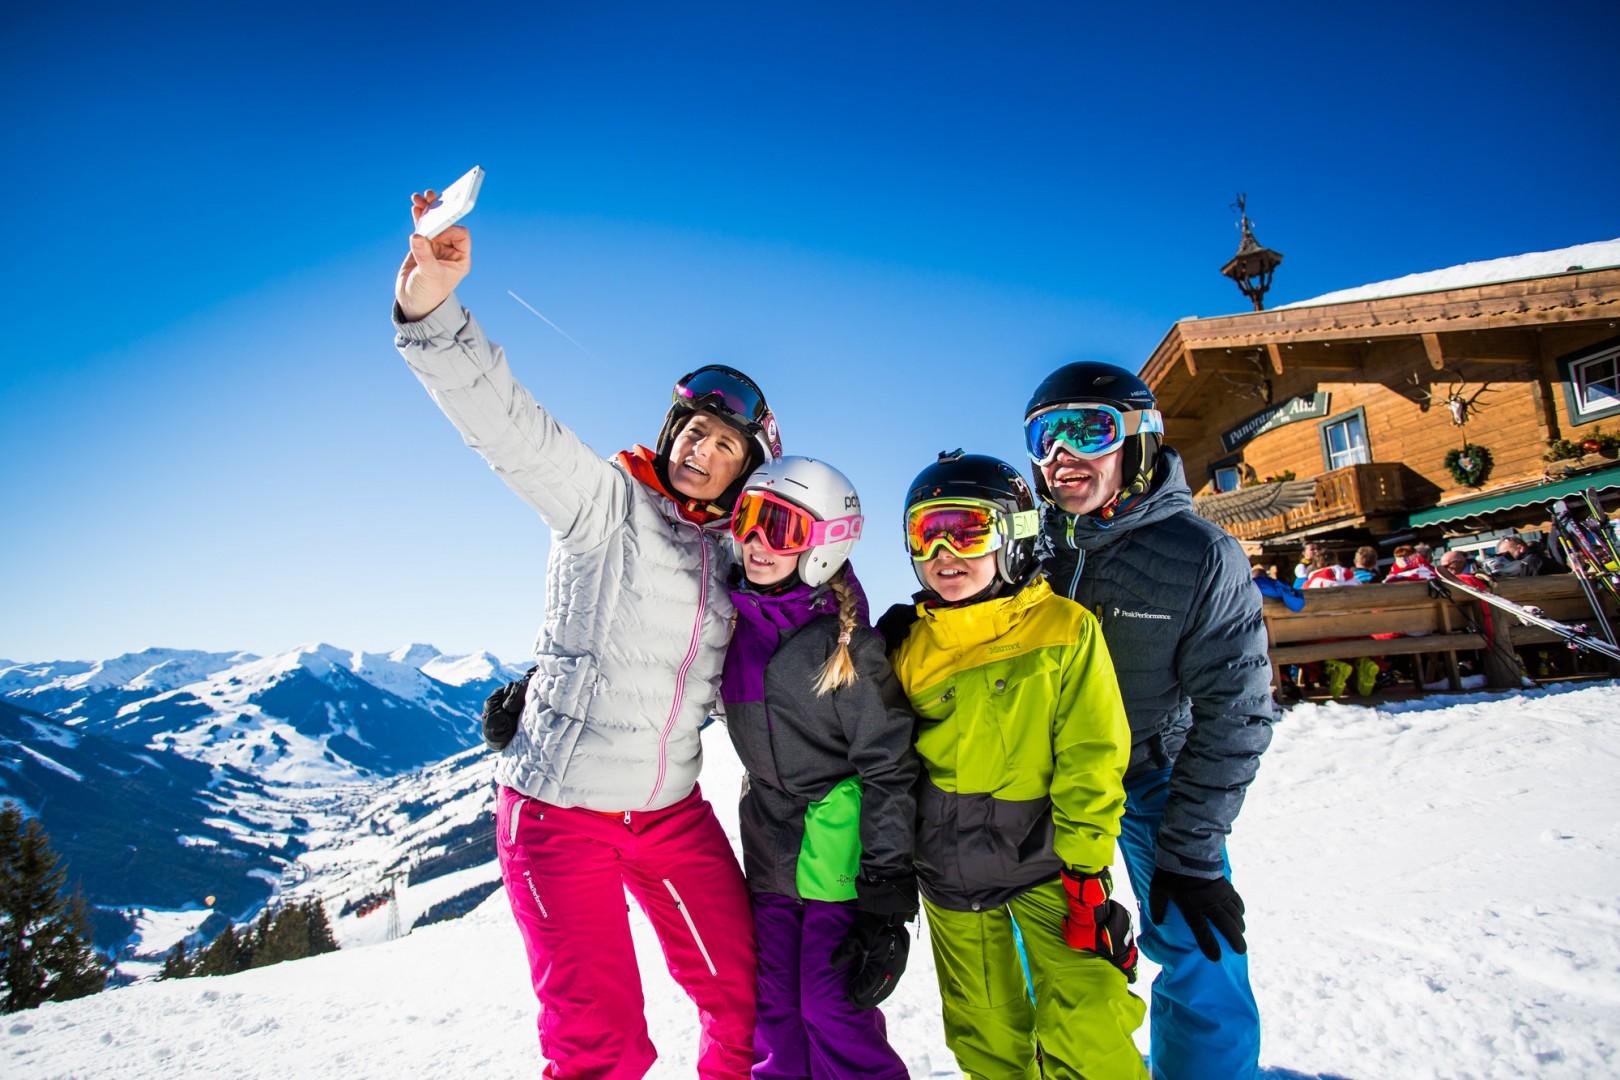 Winter Sport in Saalbach-Hinterglemm